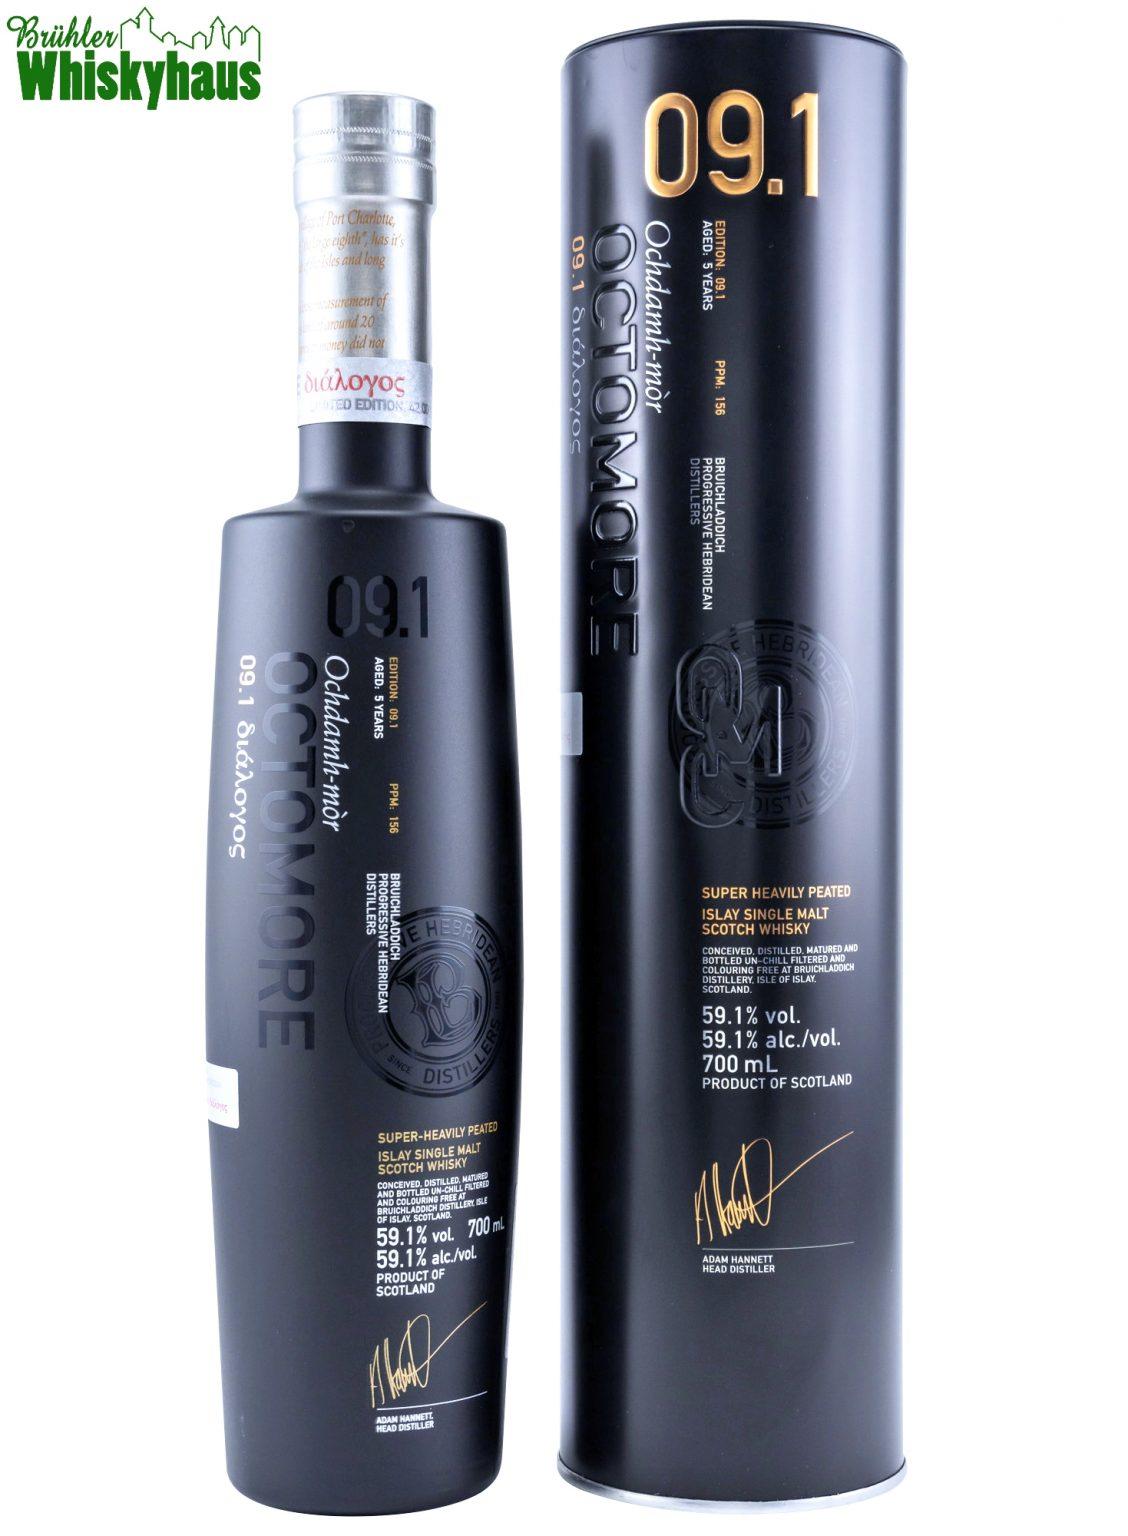 Octomore 09.1 - 5 Jahre - American Oak -Distillery Bottling - Single Malt Scotch Whisky